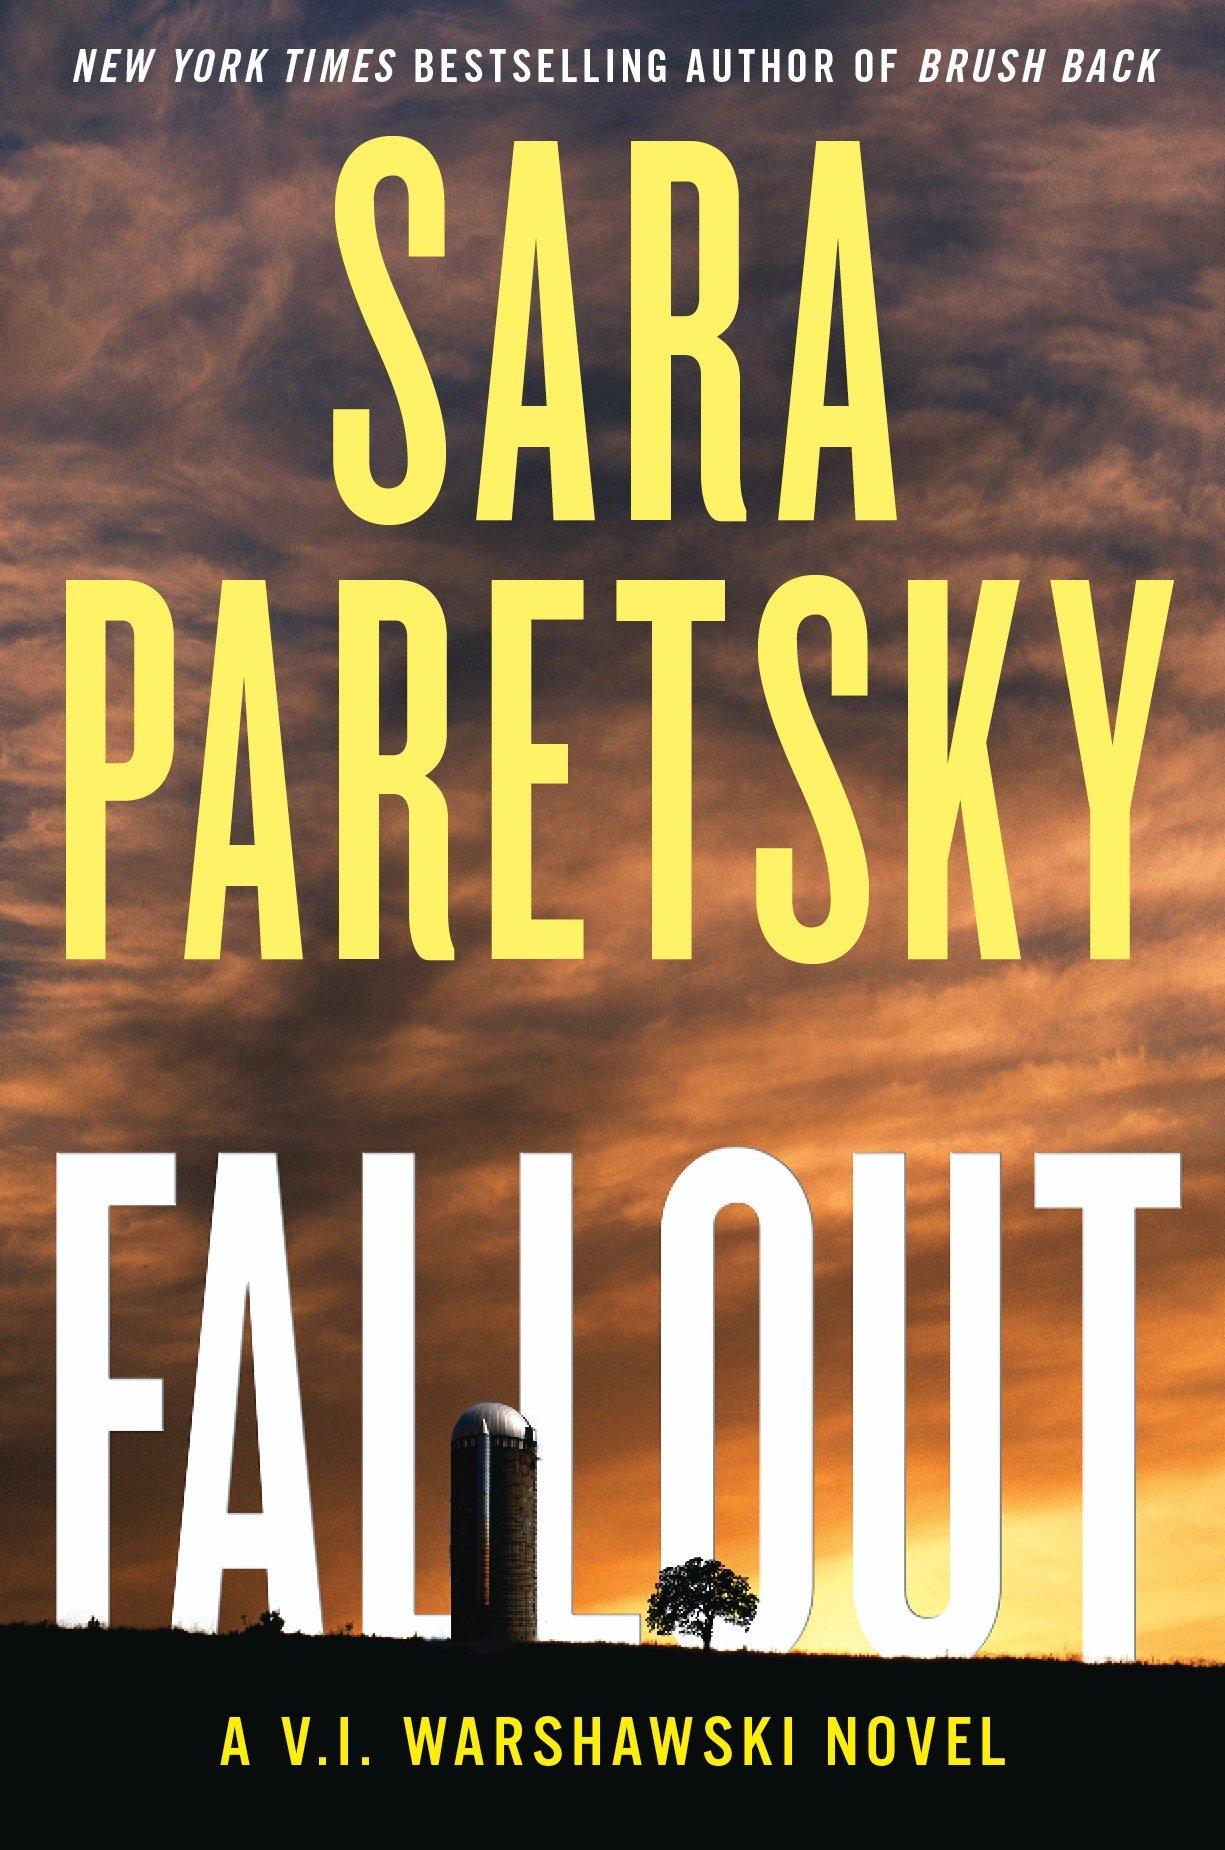 Fallout: A Vi Warshawski Novel: Sara Paretsky: 9780062663184: Amazon:  Books